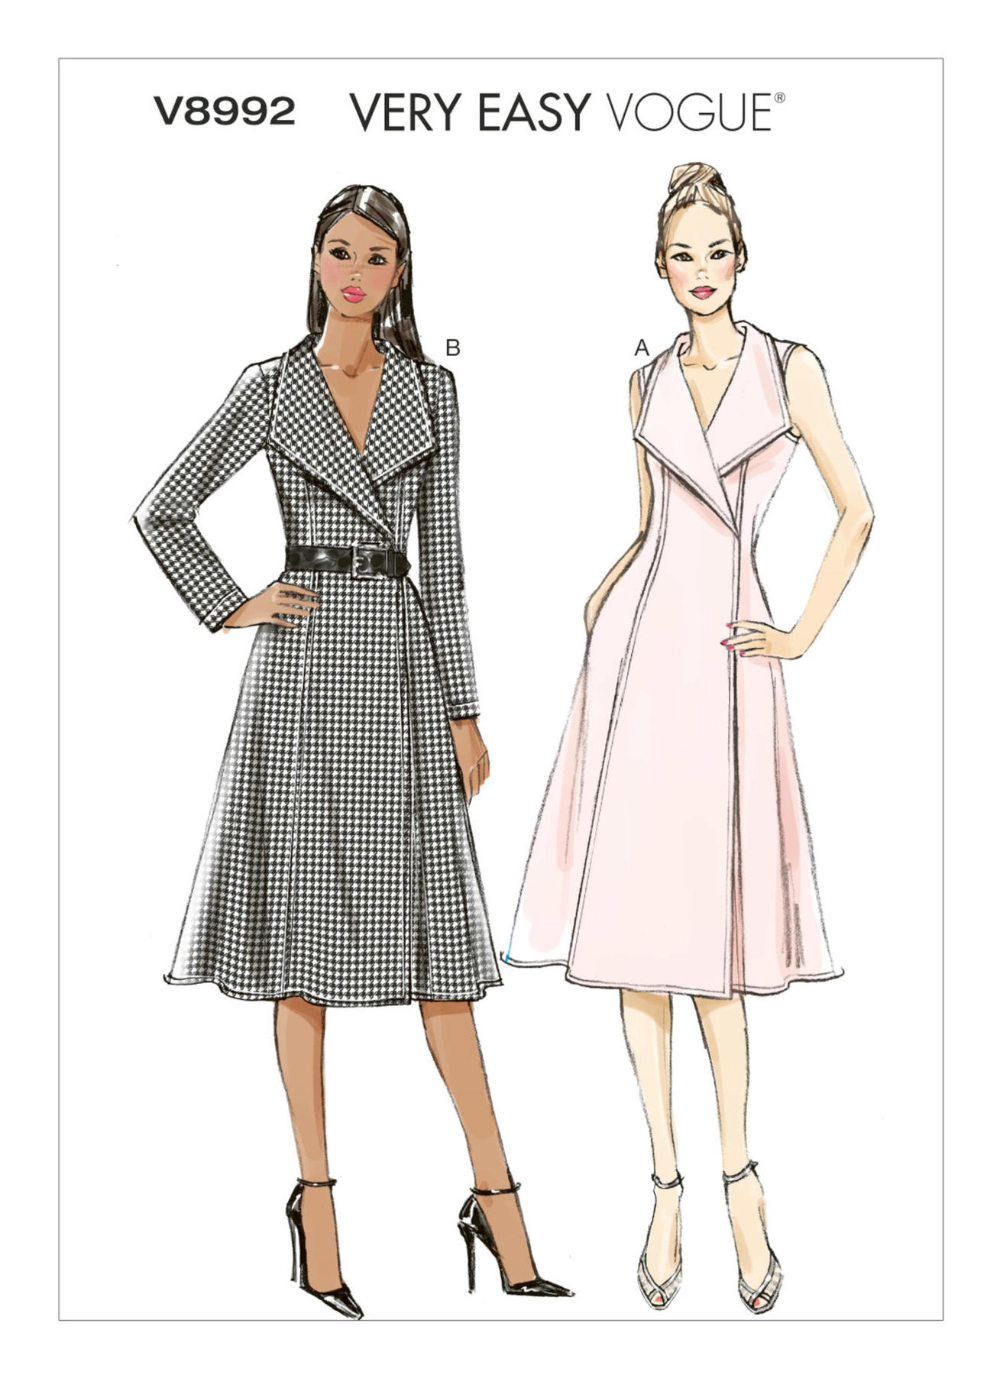 V8992 In 2021 Wrap Dress Sewing Patterns Dress Patterns Vintage Dress Patterns [ 1375 x 1000 Pixel ]